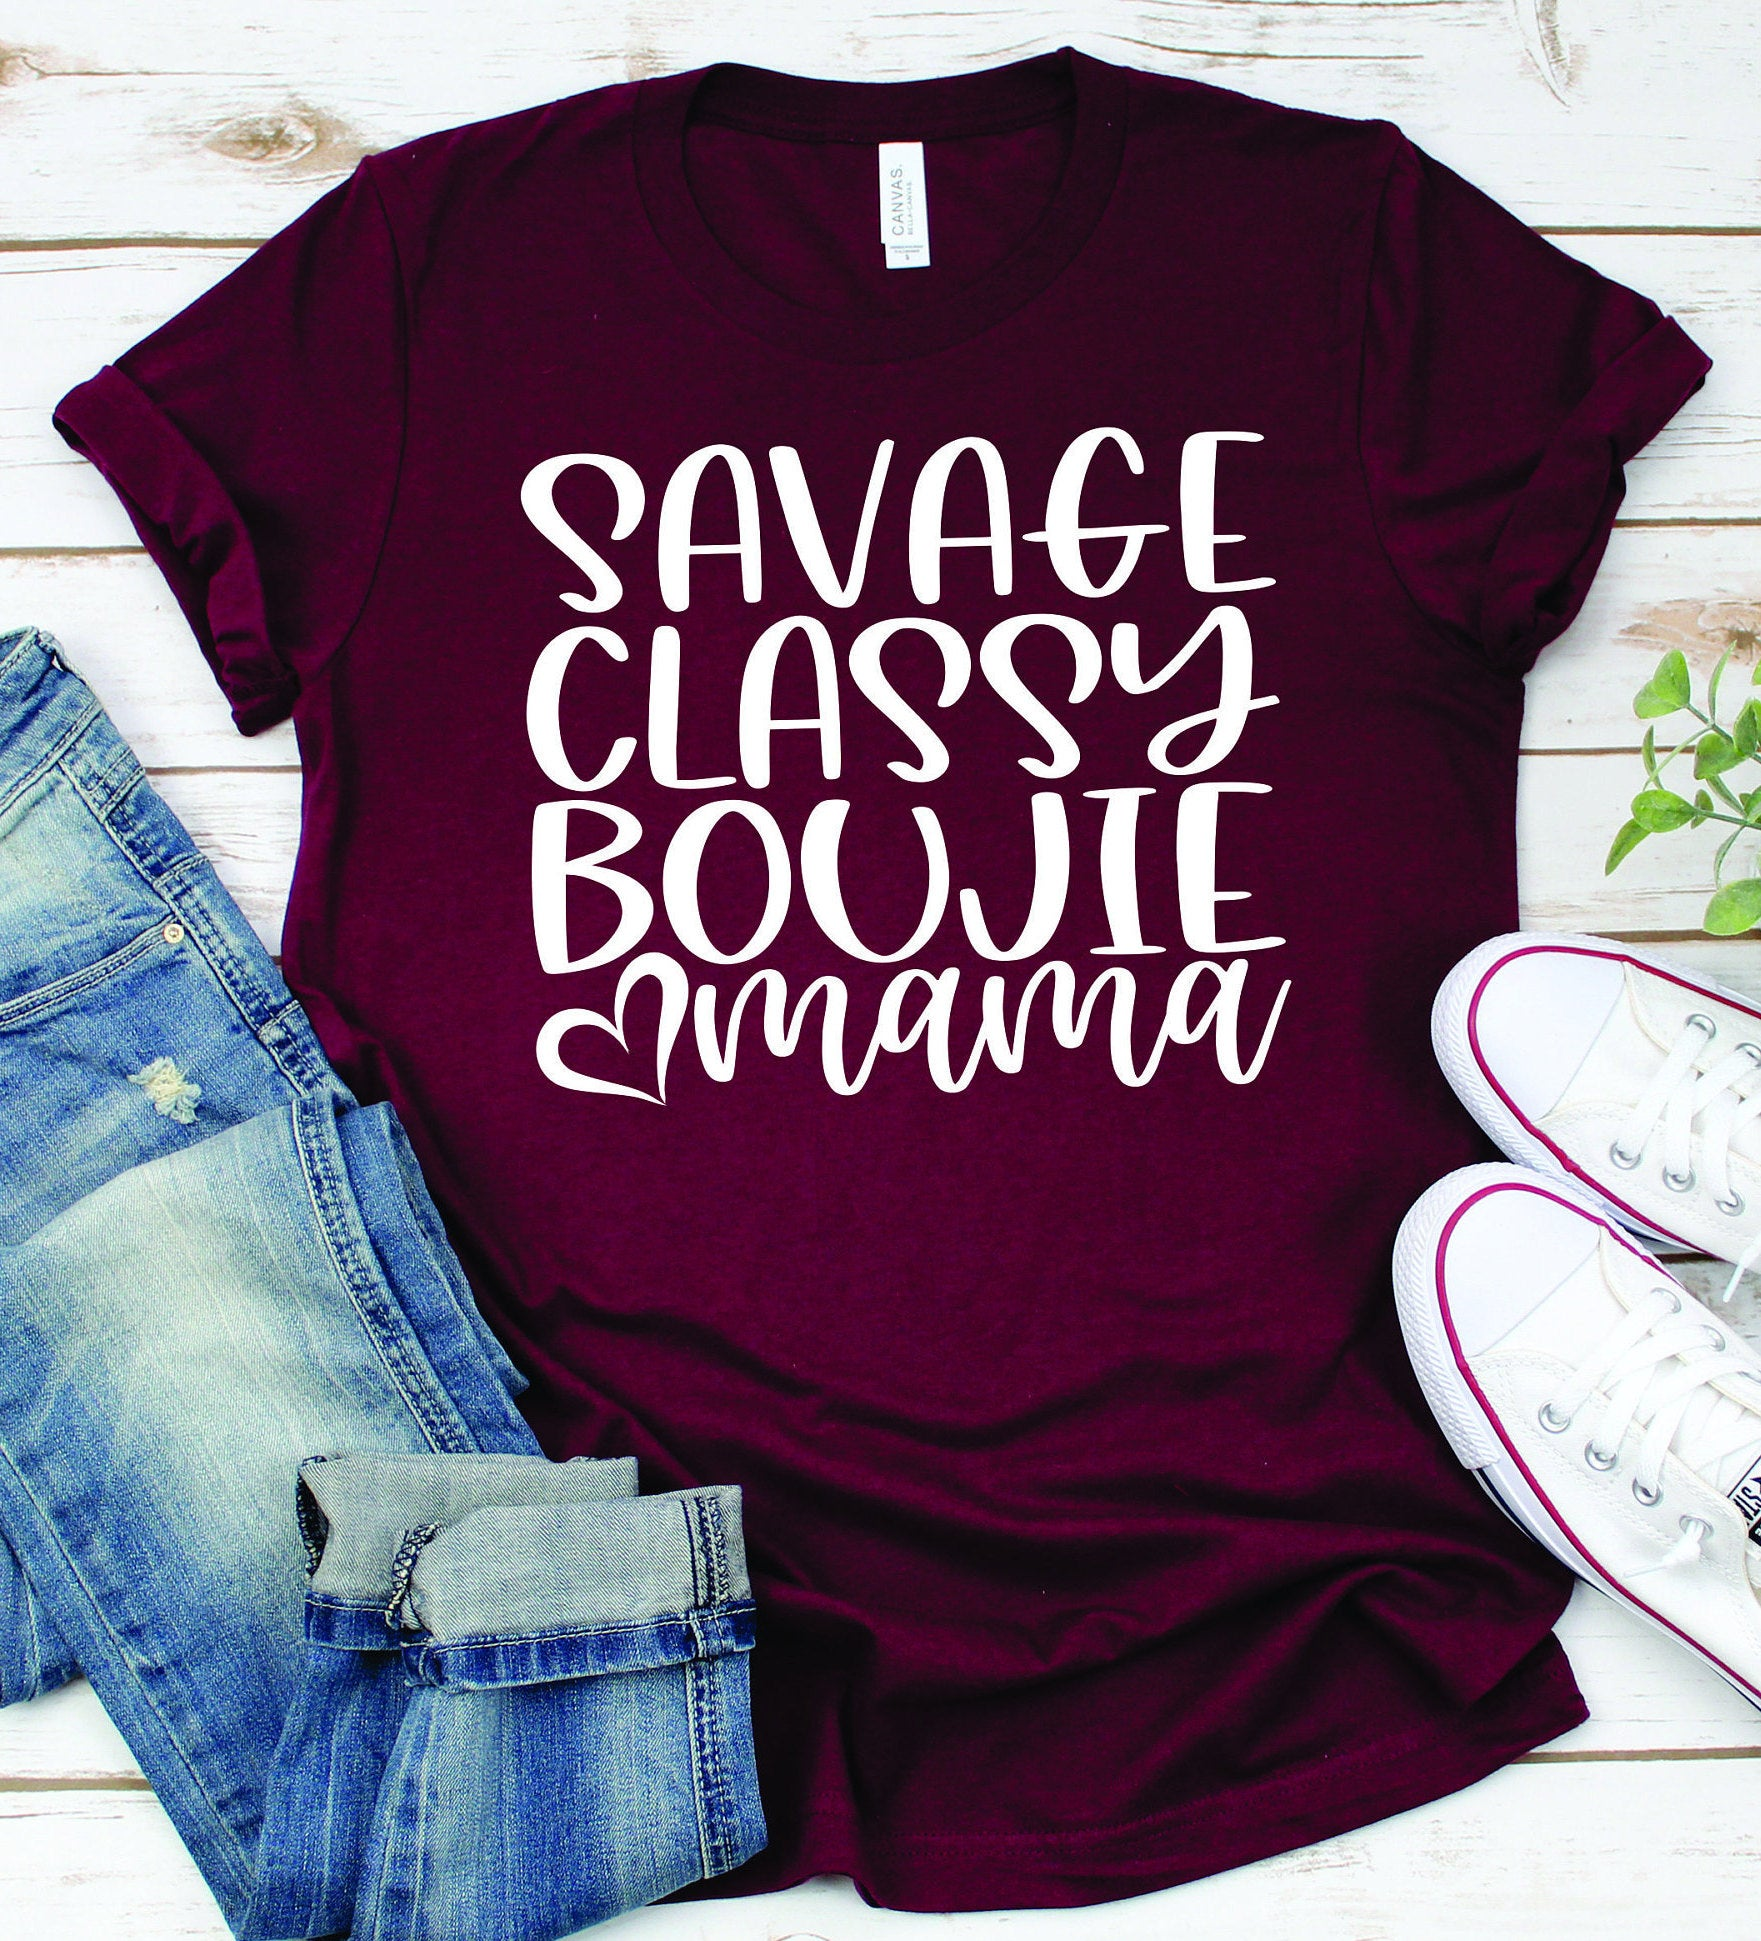 Savage-classy-boujie-mama-svg-mothers-day-svg-girl-mom-svg-boy-mom-svg-mom-quote-svg-motherhood-svg-mothers-day-svg-design-cricut-60514a4f